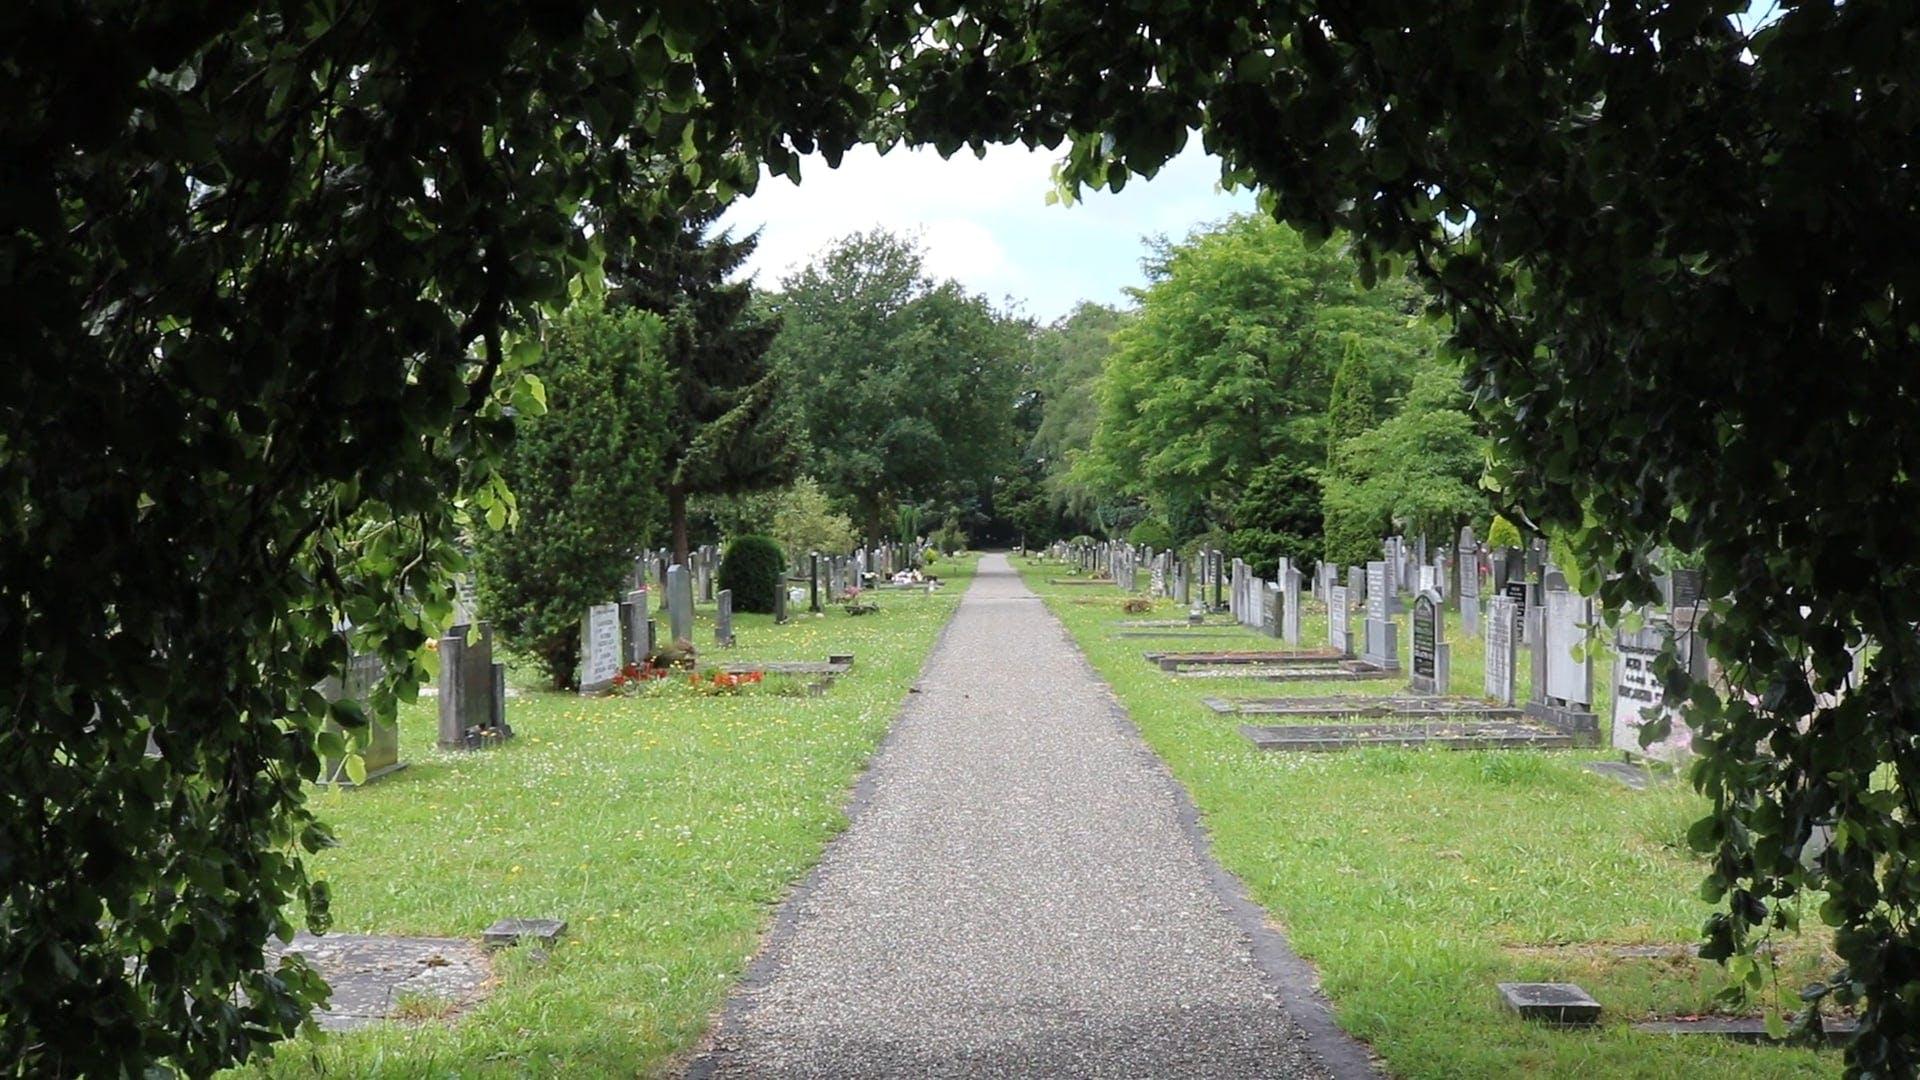 A Simple Memorial Park